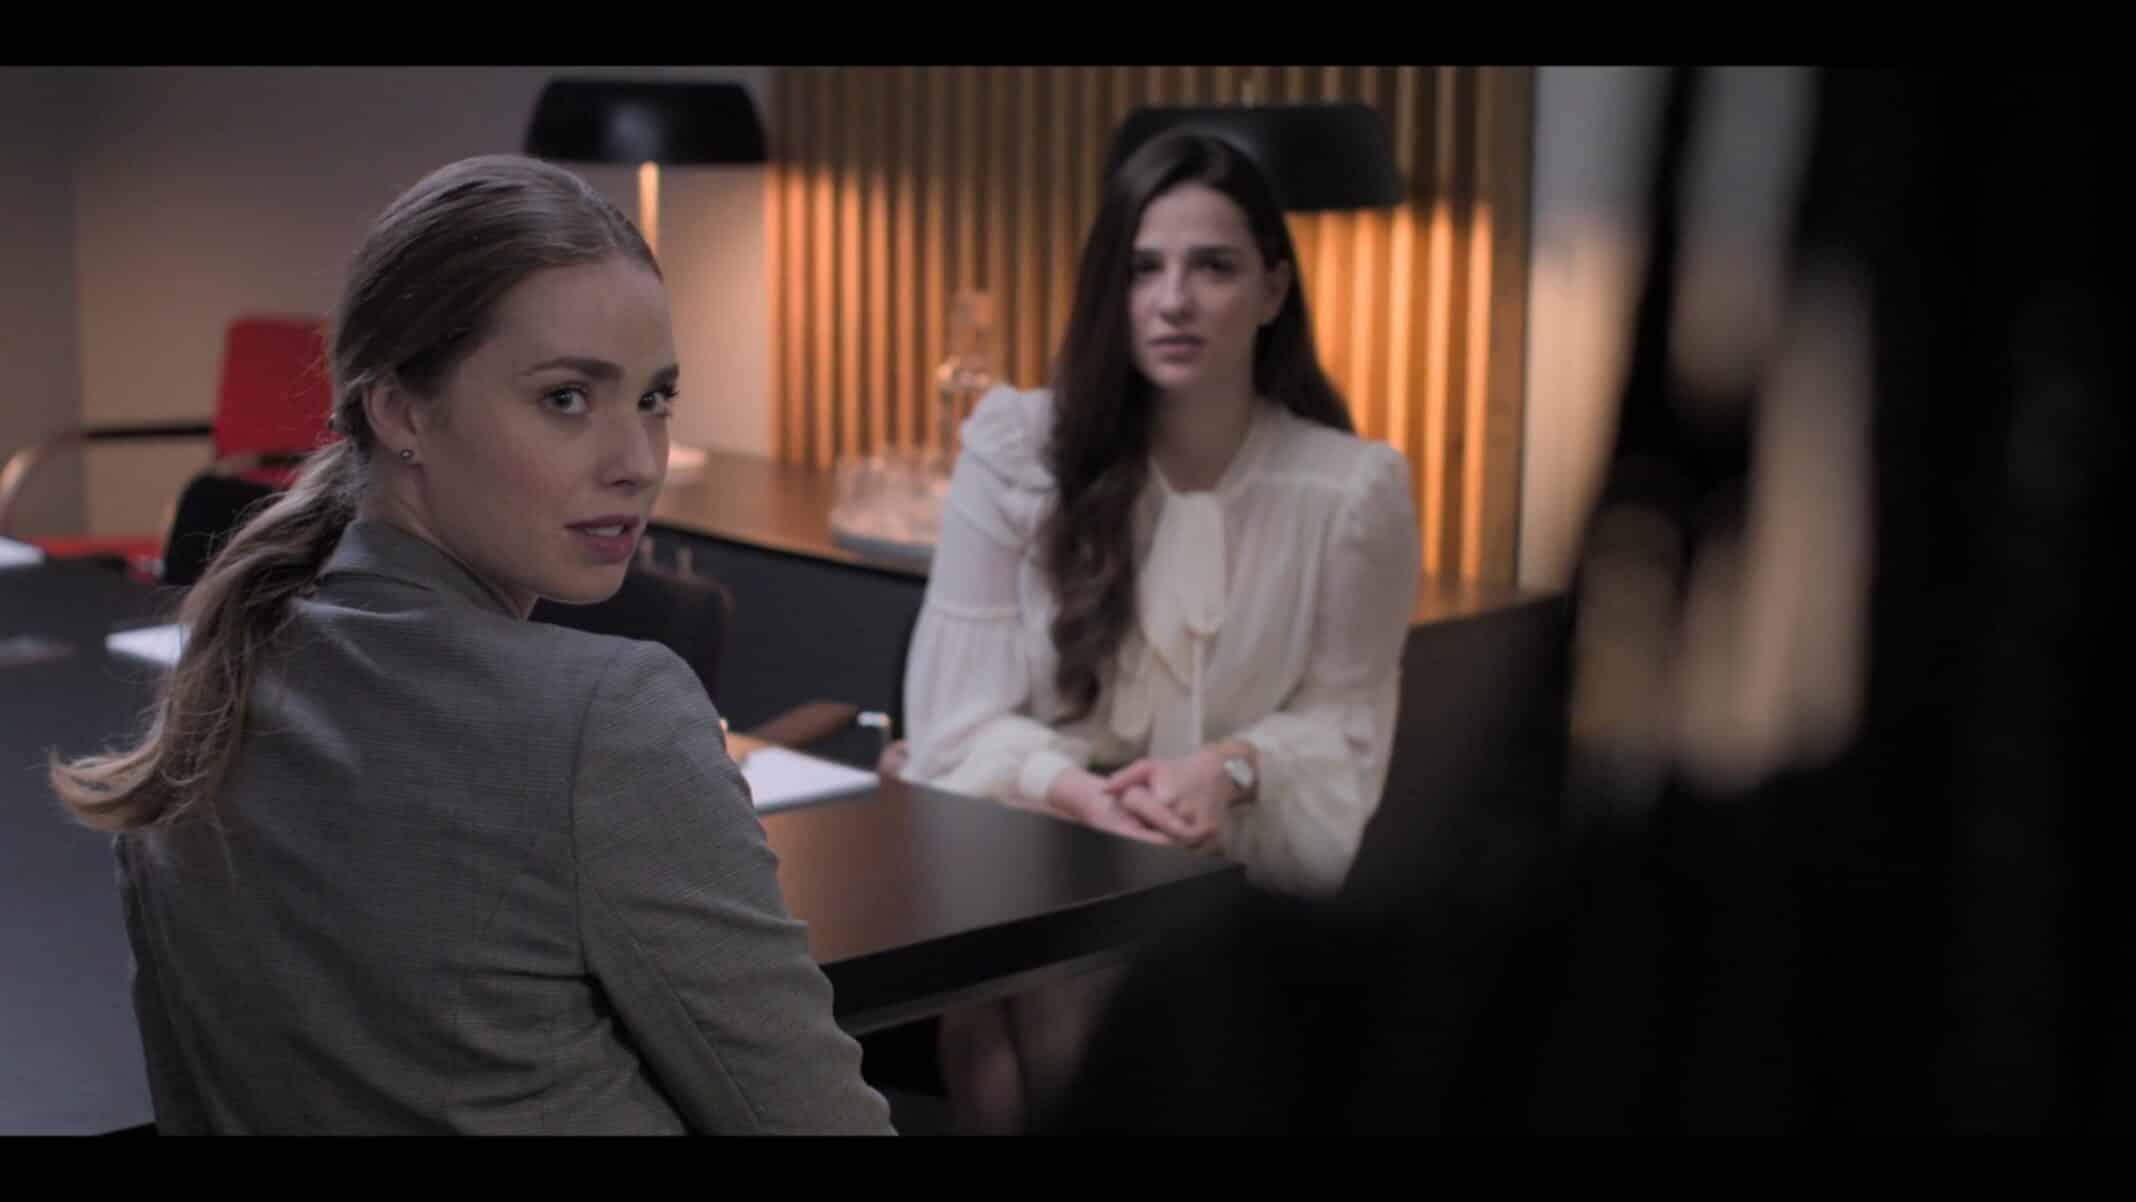 Daria and Yasmin in a meeting